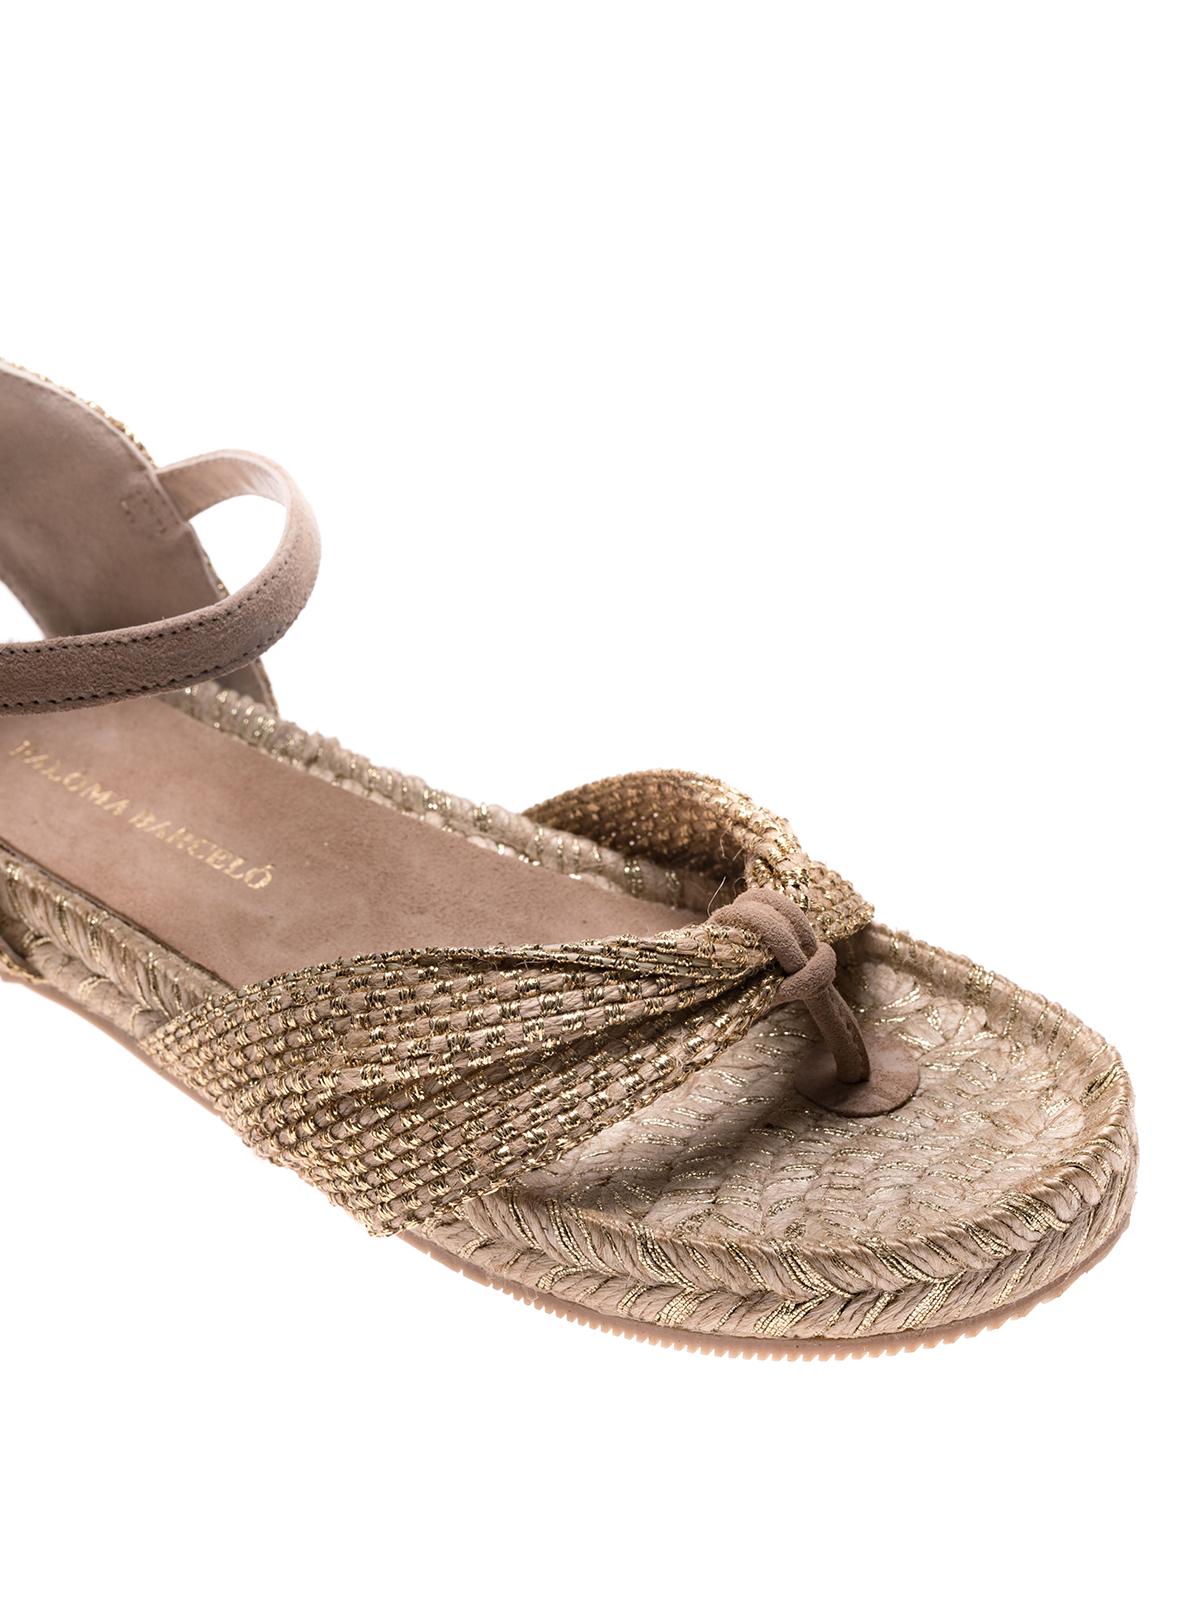 Clinopodio Or Sandales Flip Flop Paloma Barcel iTaGy